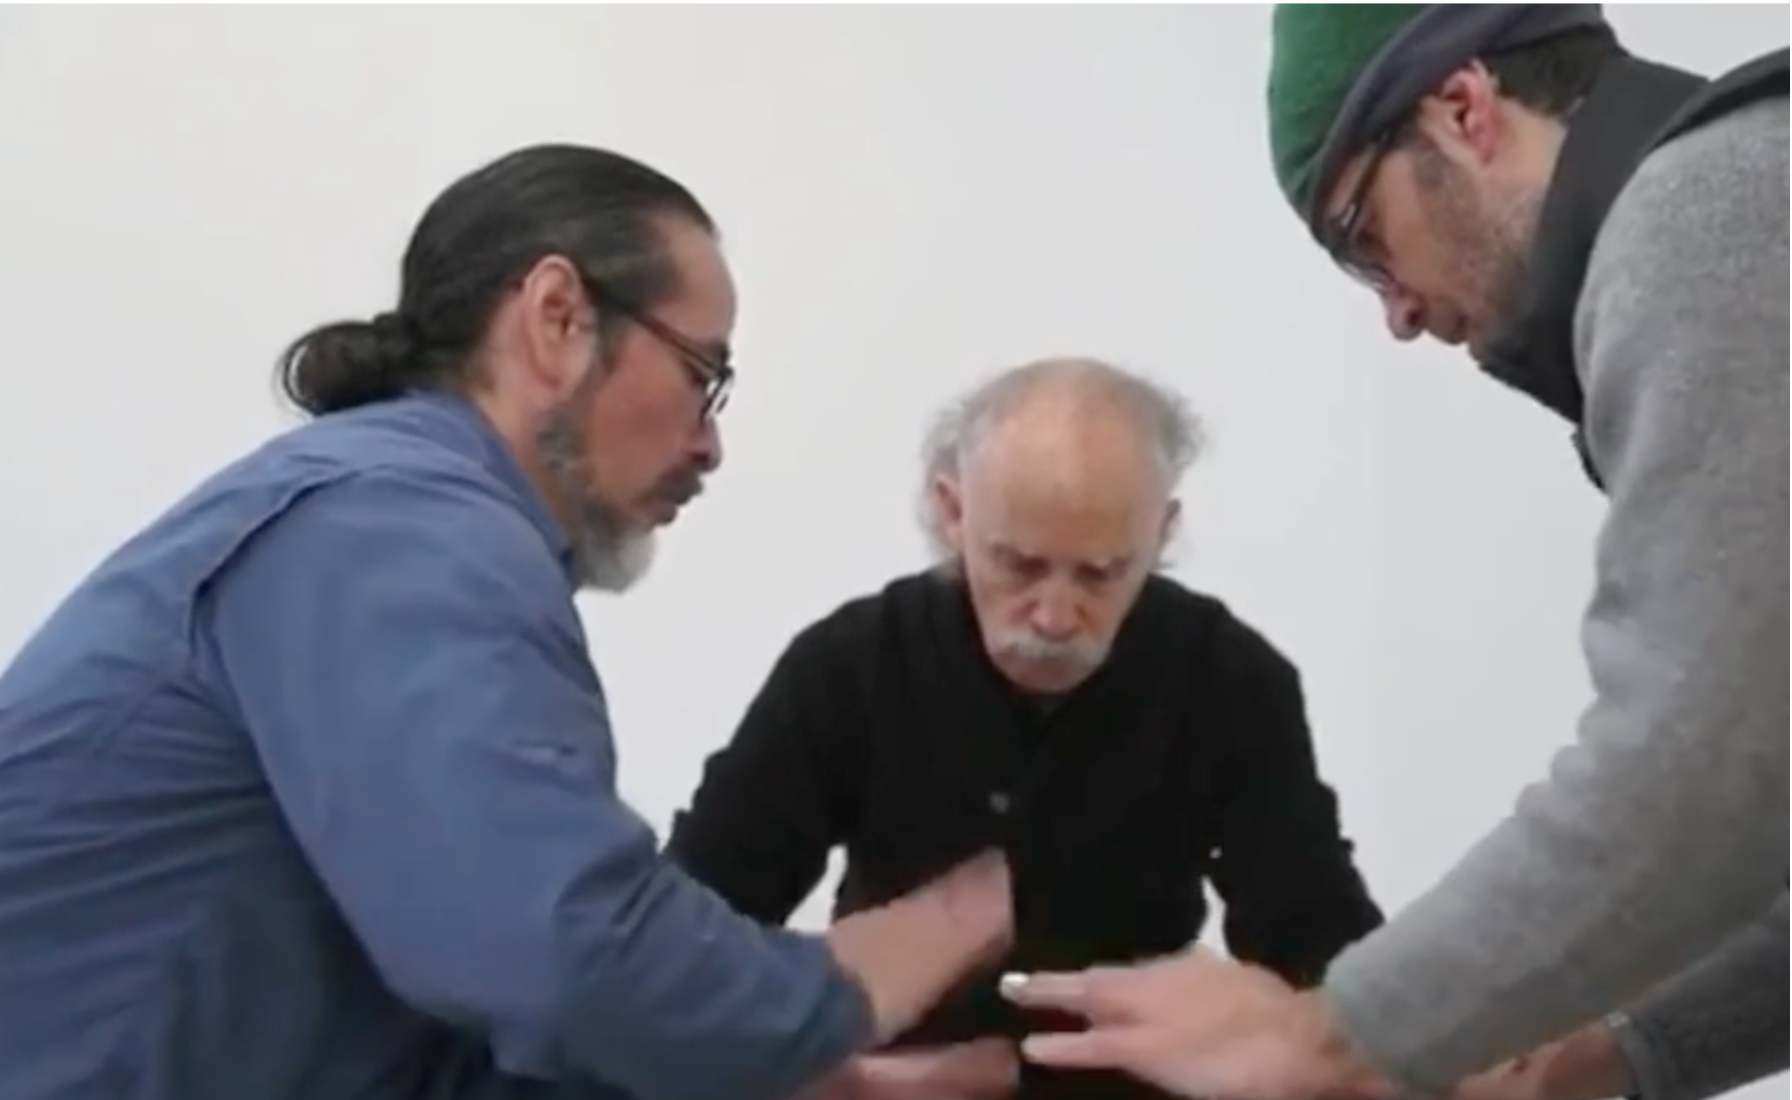 Pedro Reyes, Música para Litófonos | Interpretado por Tambuco, 2018